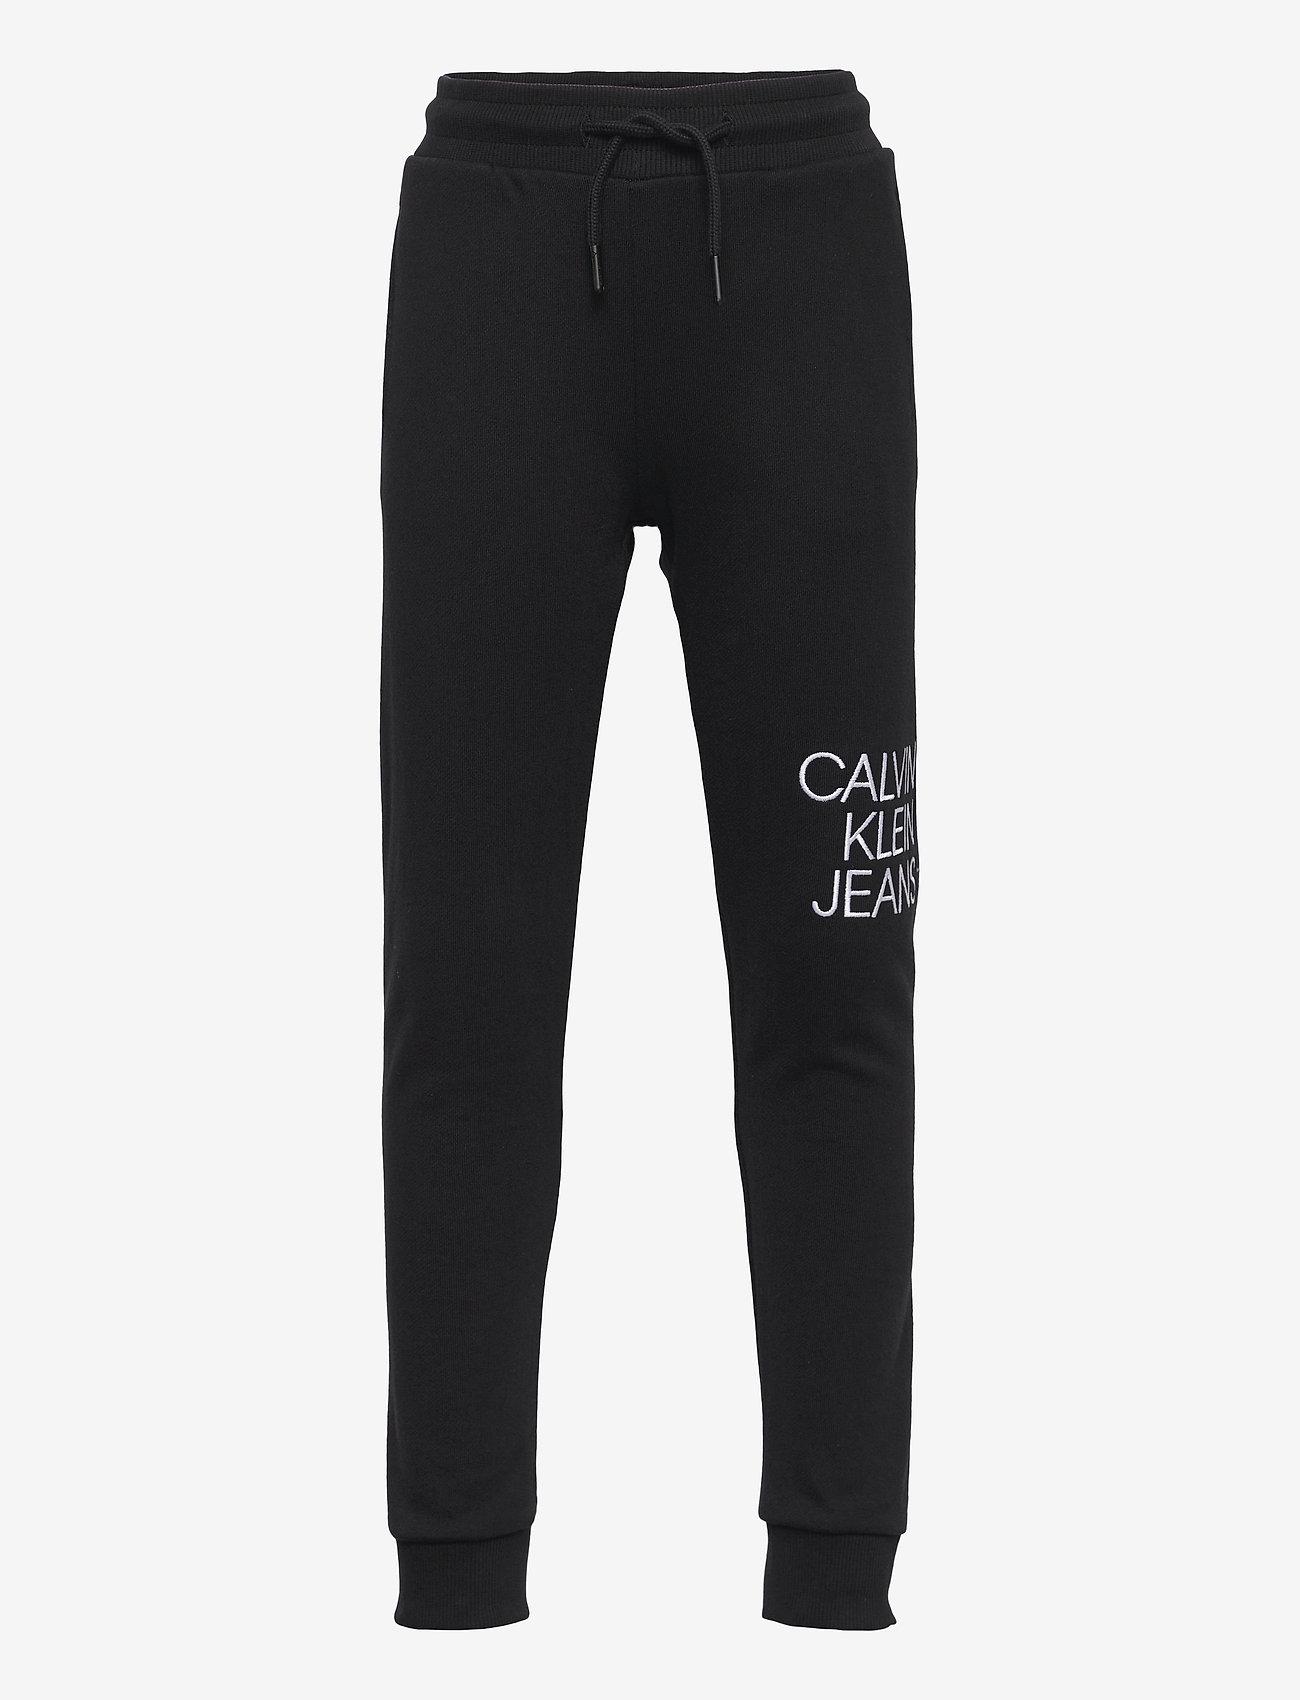 Calvin Klein - HYBRID LOGO SWEATPANTS - jogginghosen - ck black - 0